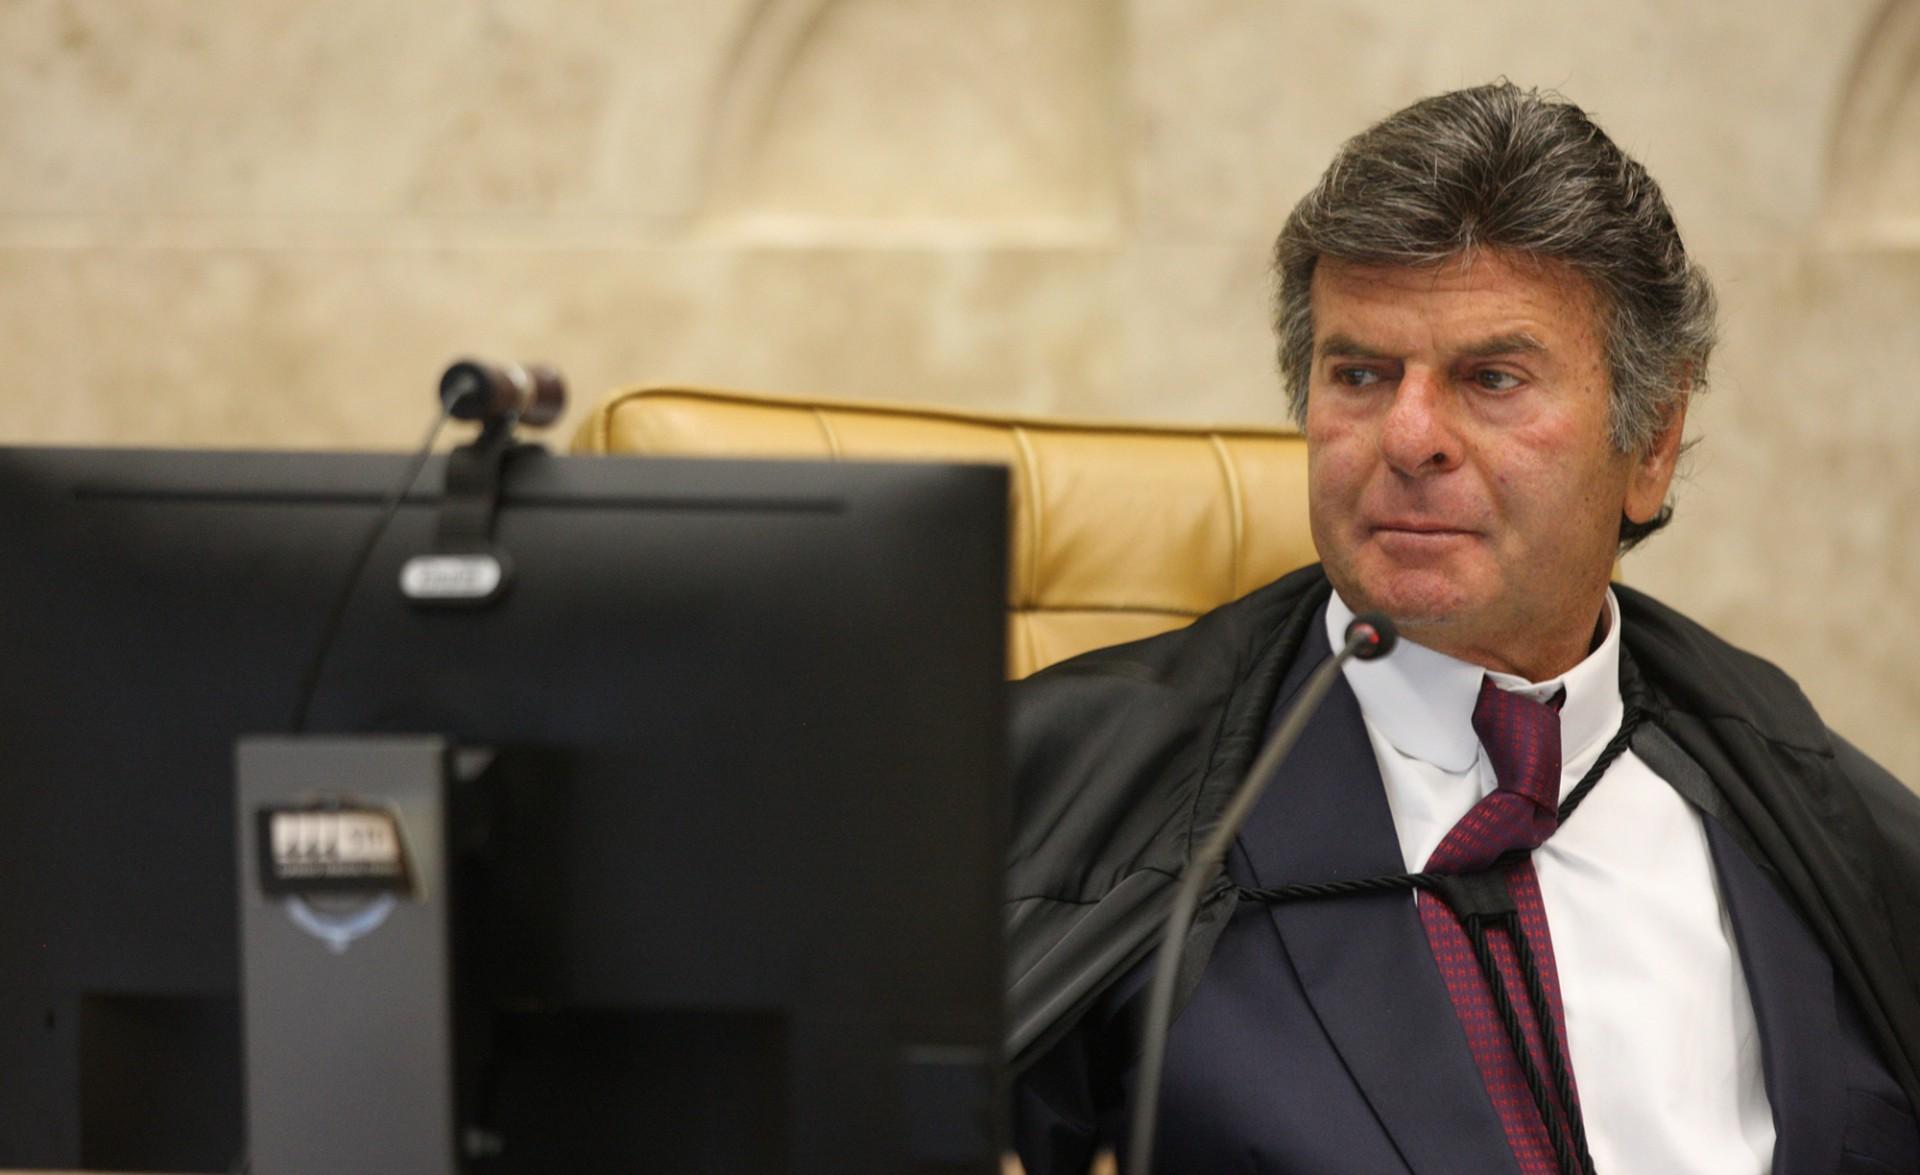 Ministro Luiz Fux, presidente do STF